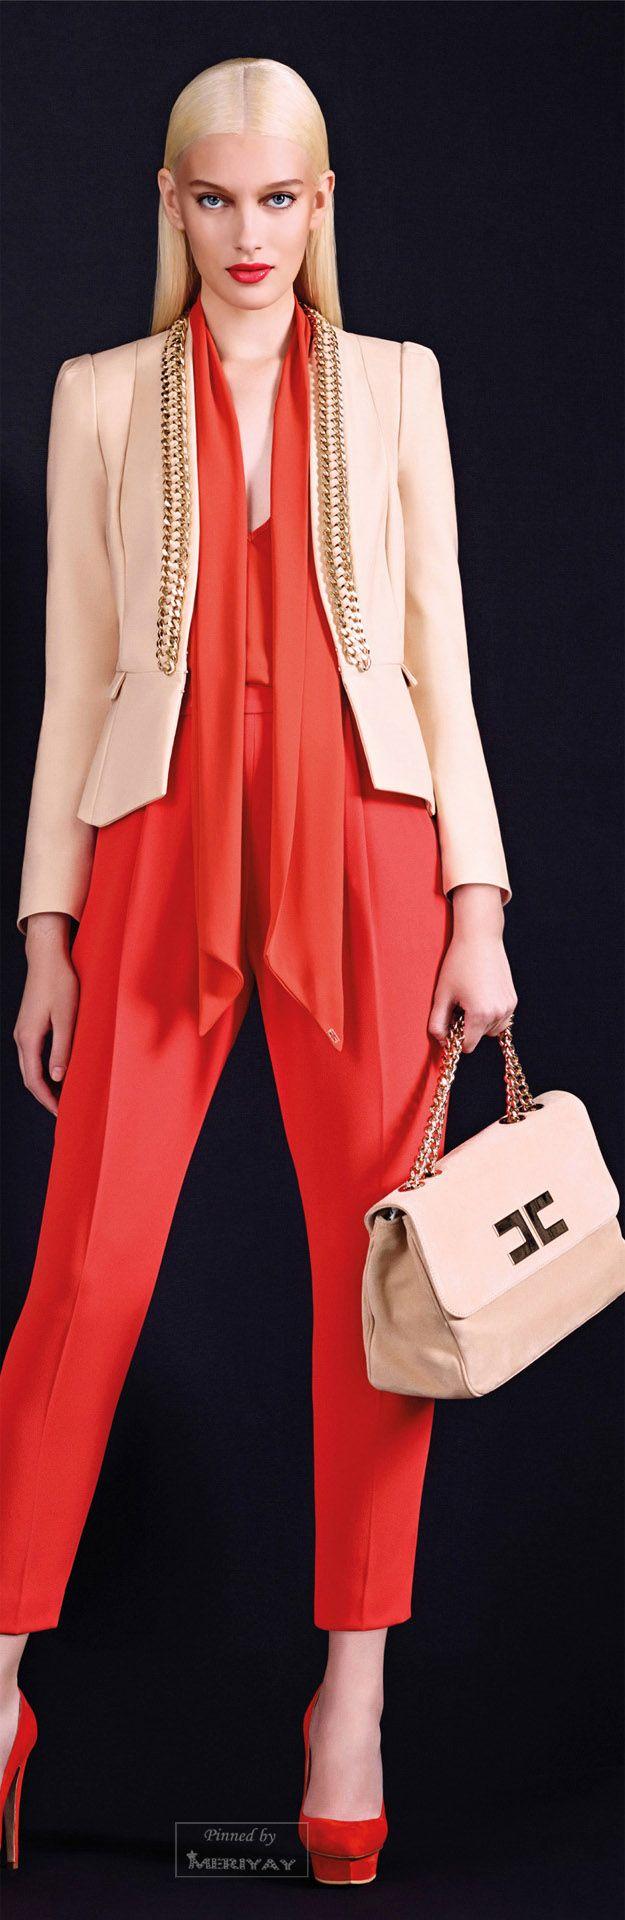 Elisabetta Franchi .FallWinter 2014-2015. / Bag / Shoes / Pants / Top / Jacket / Blazer / Hair / Character